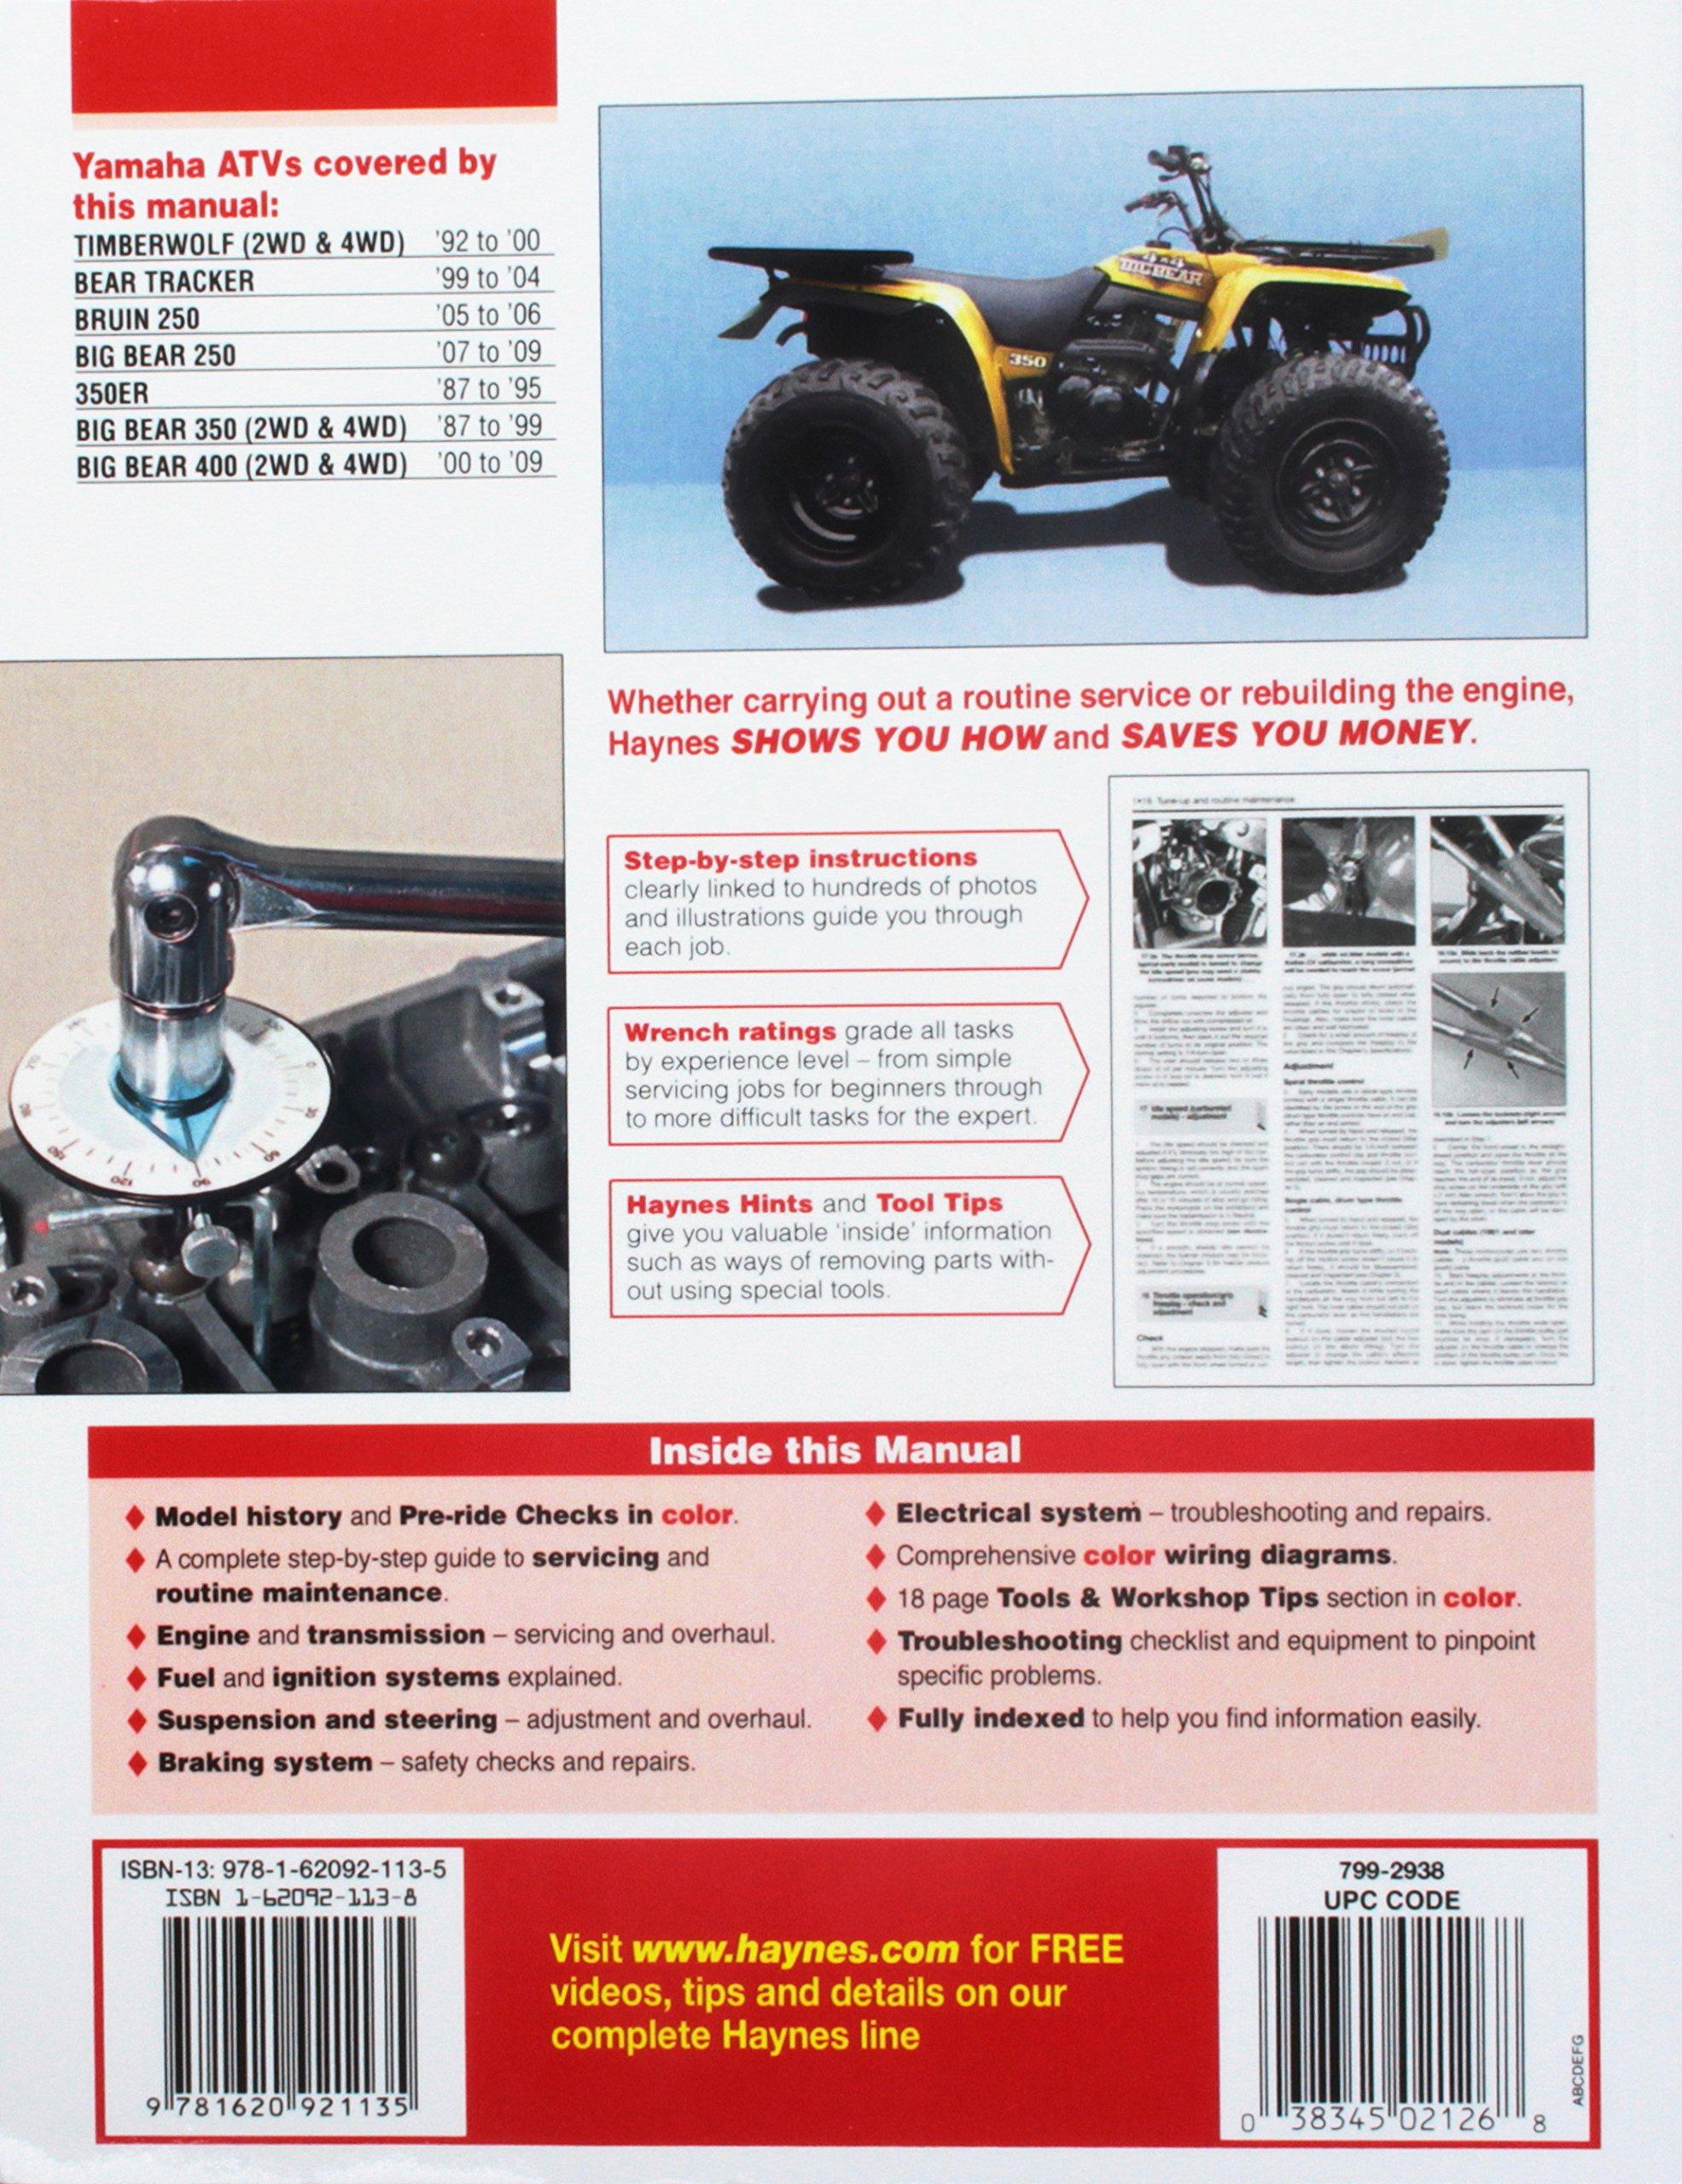 Yamaha Atvs Timberwolf Bruin Bear Tracker 350er And Big 1987 350 Wiring Diagram 2009 Haynes Service Repair Manual Editors Of Manuals 9781620921135